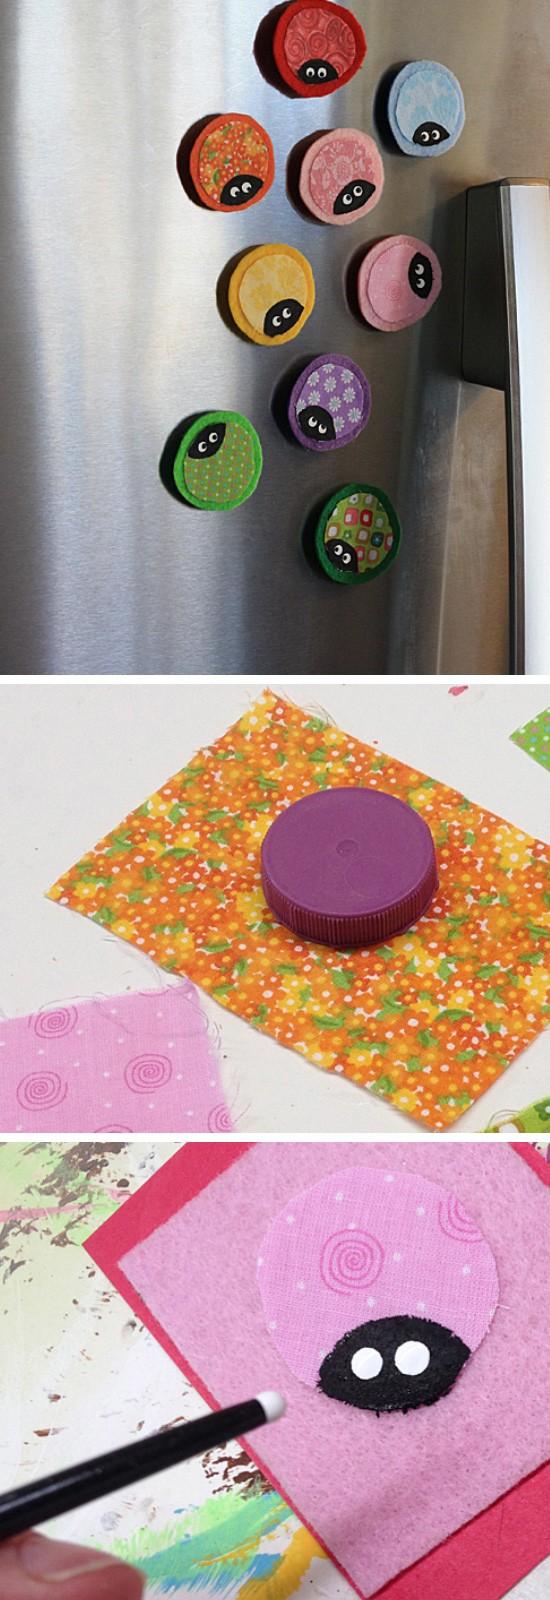 30 Easy Spring Craft Ideas Tutorials For Kids Page 22 Foliver Blog